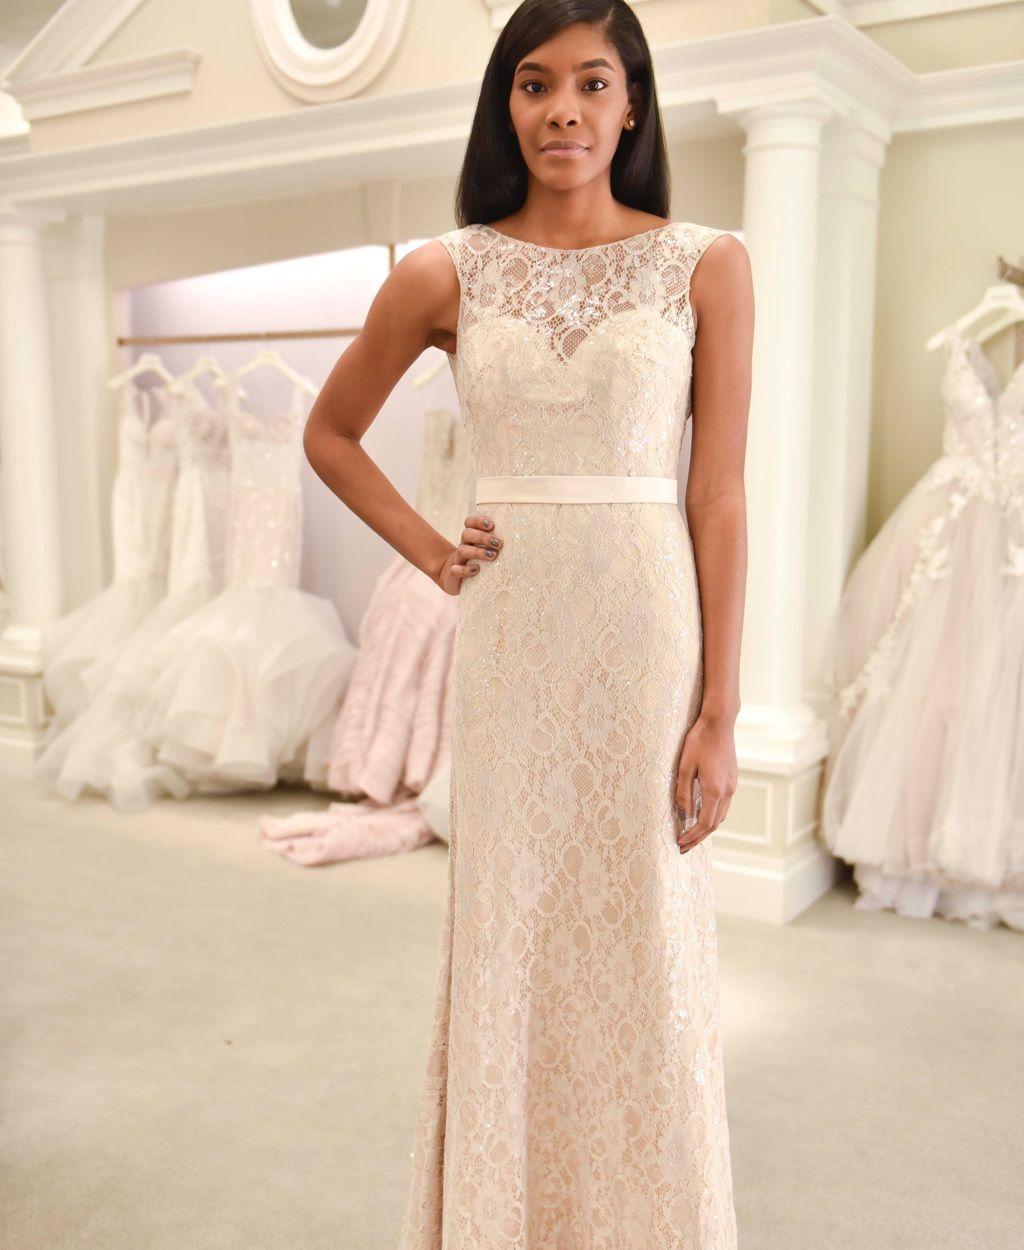 Help Plan The Knot Dream Wedding Dream wedding, Allure